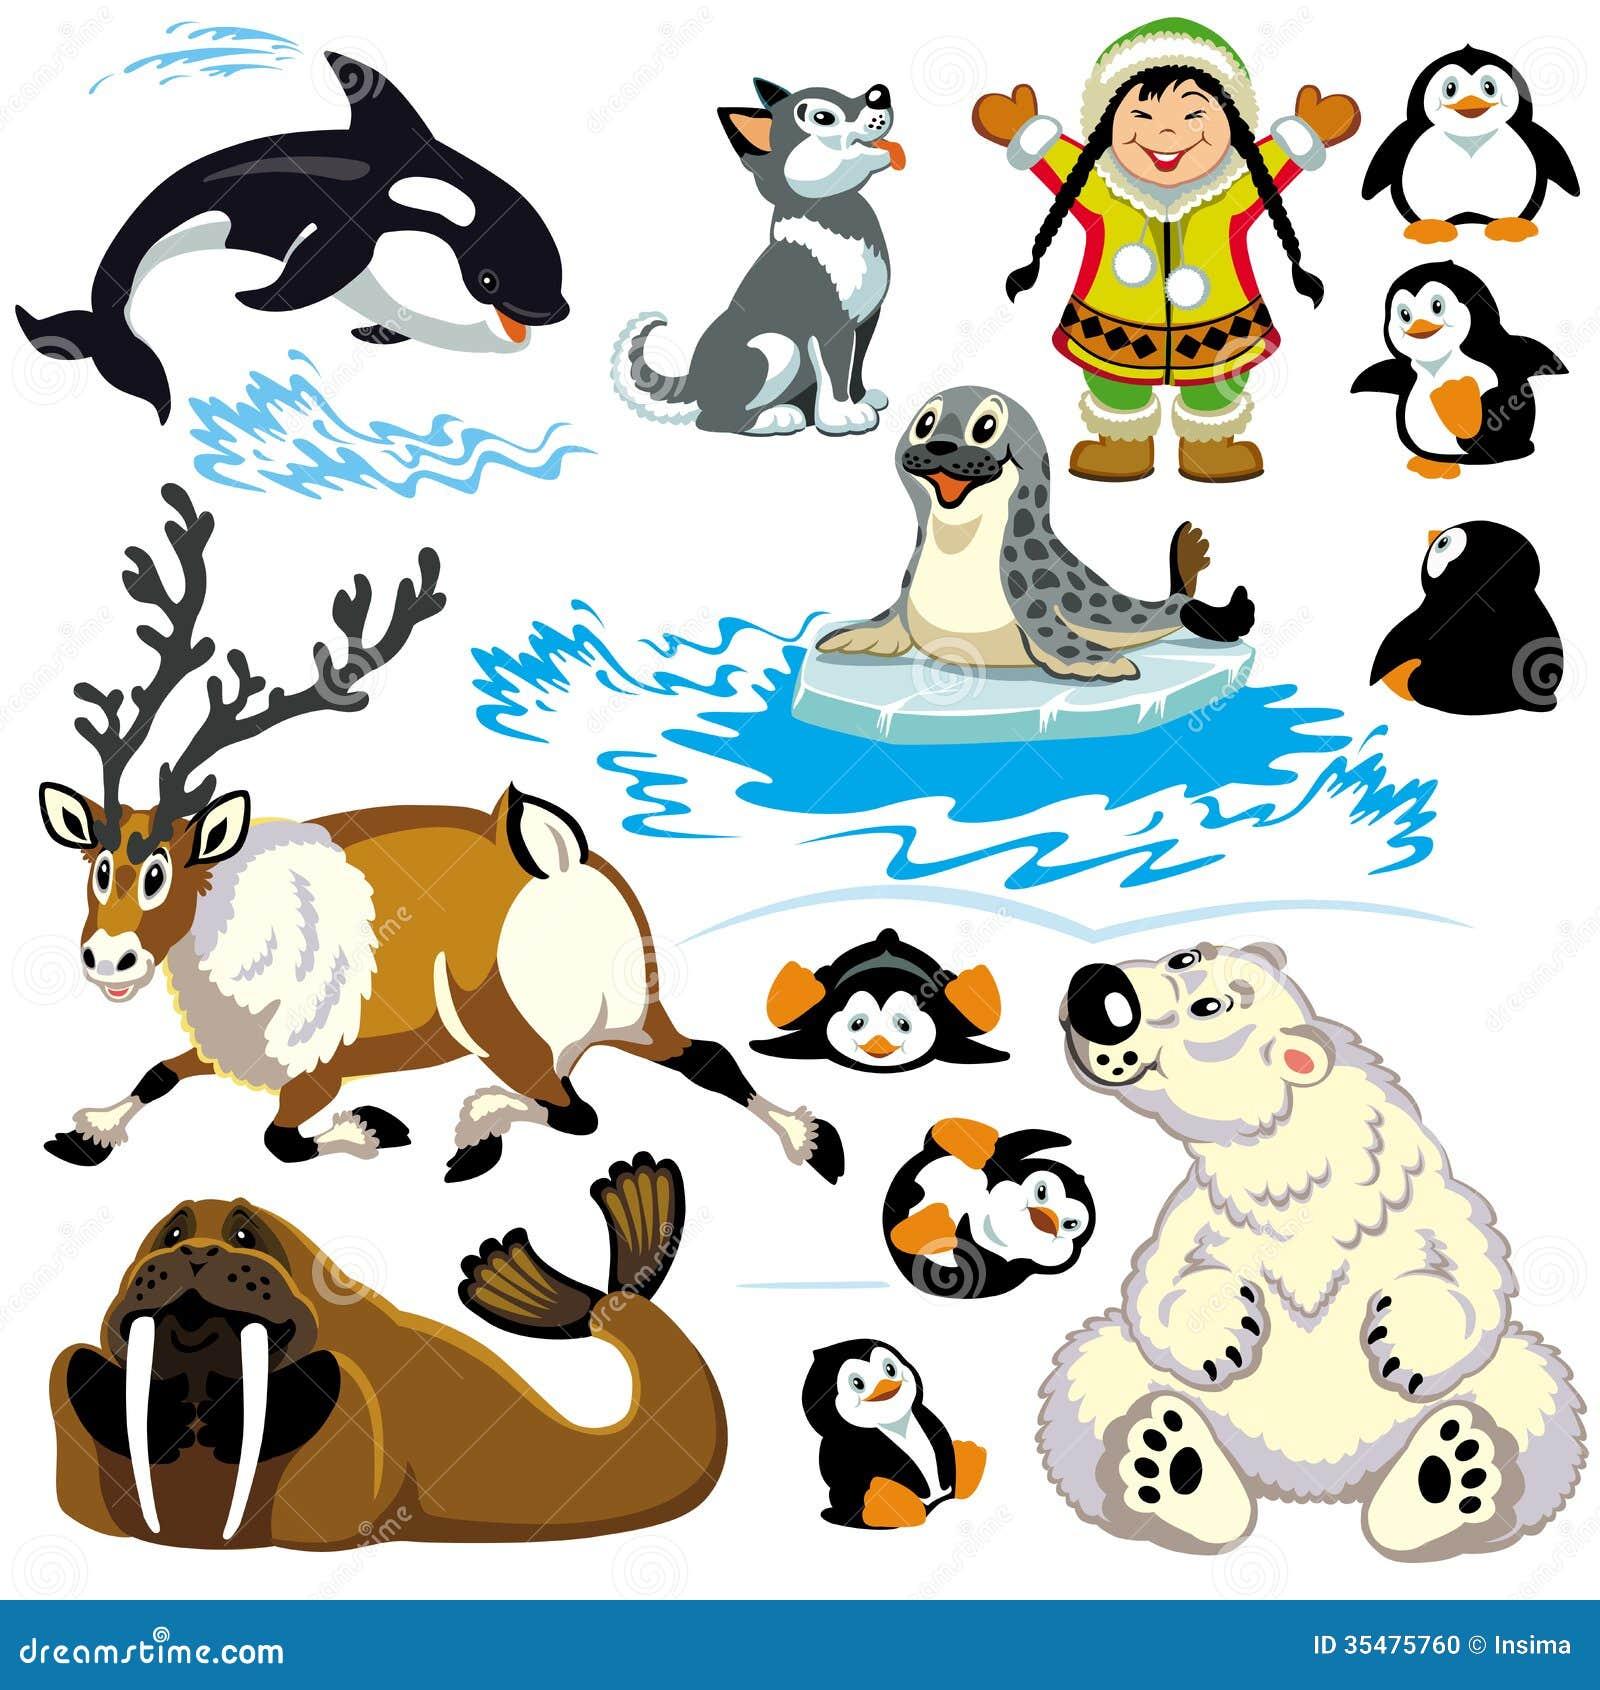 antarctic animals for kids - photo #10